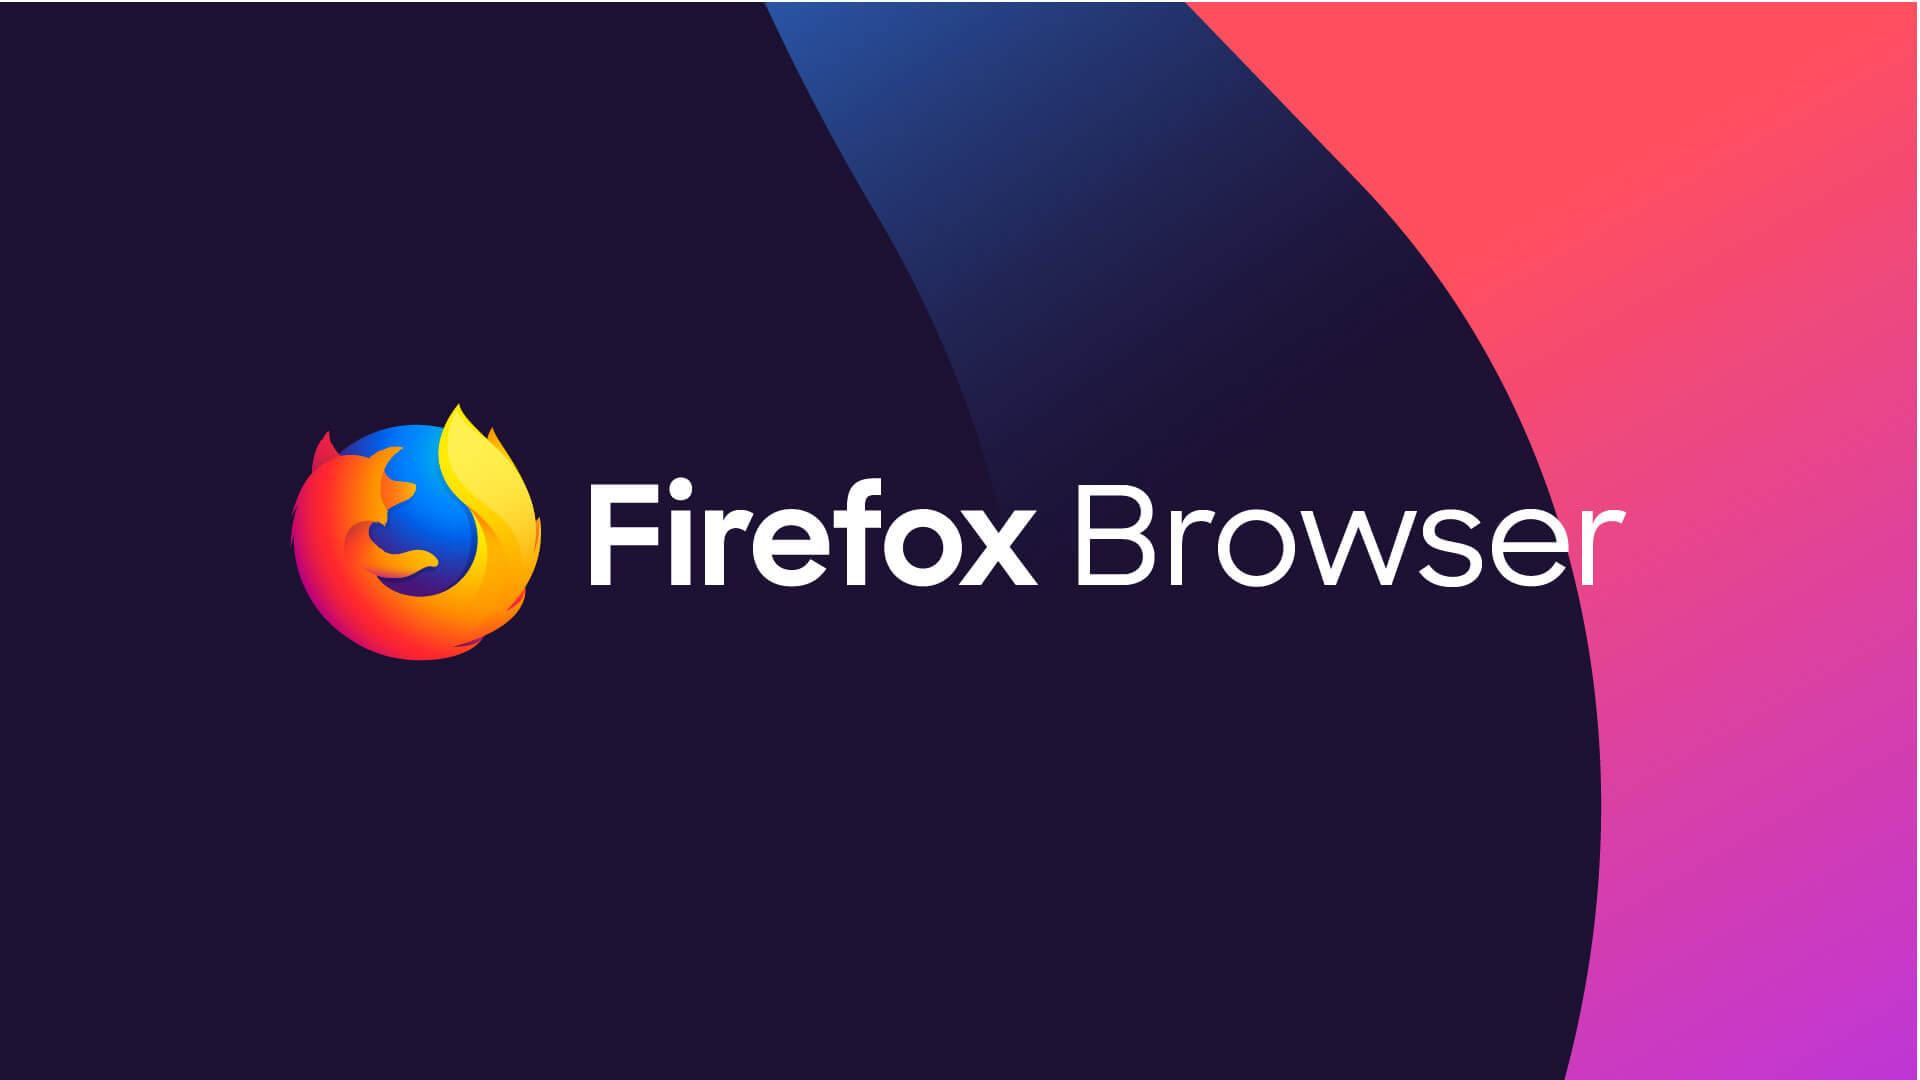 Mozilla Firefox 77.0.1  [Instalador Fuera de Linea] [Español] [UL.IO] Mozilla-Firefox-70